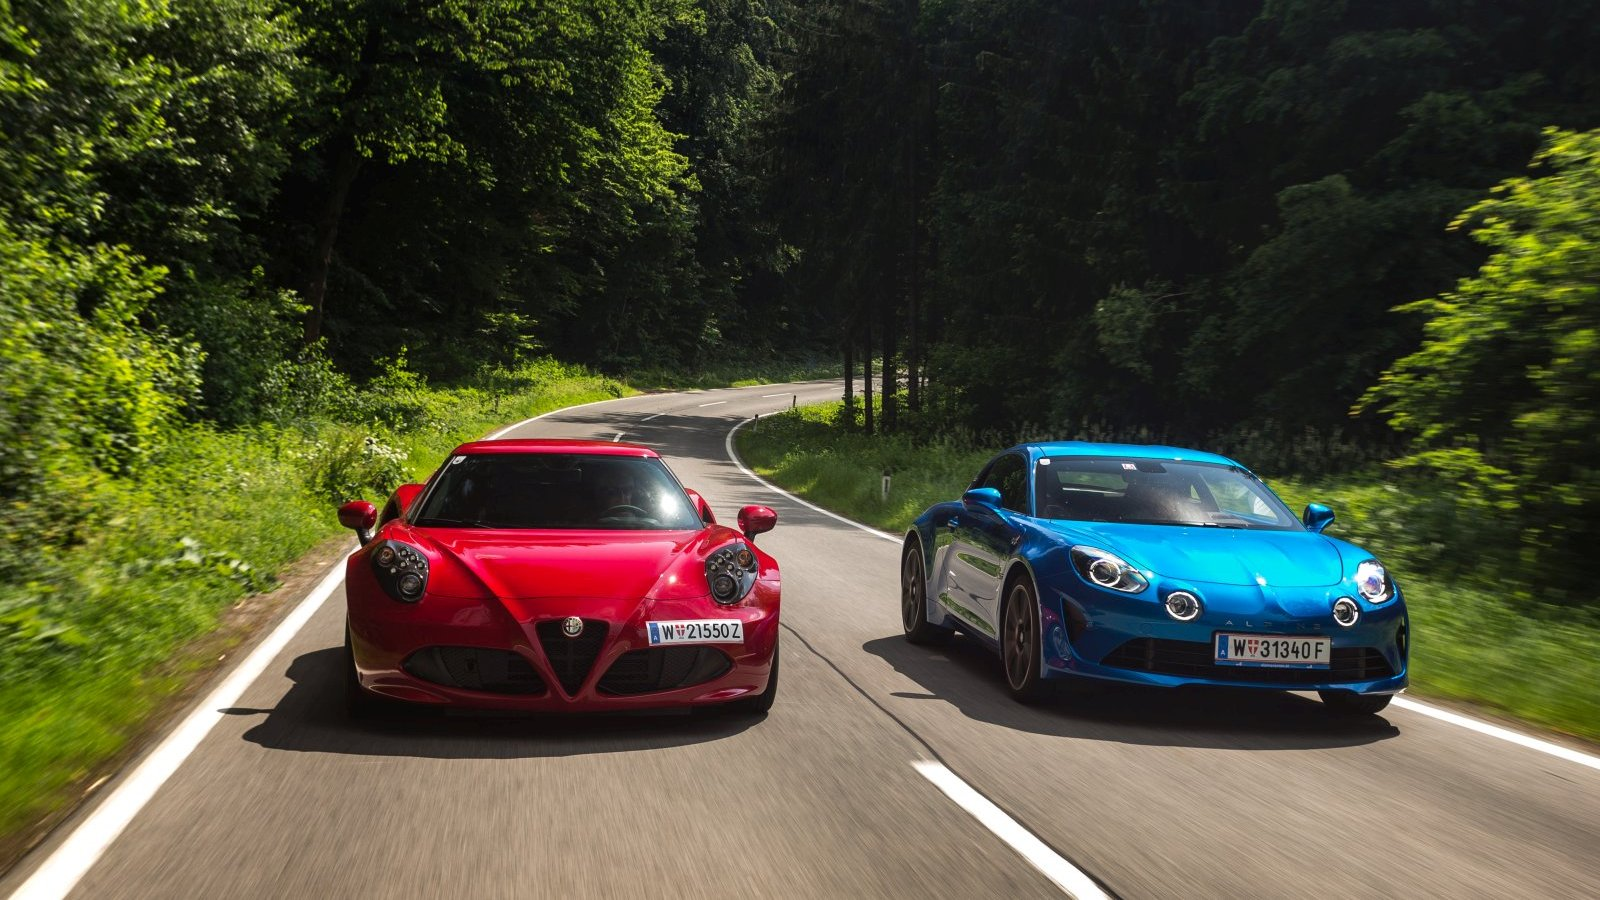 Wonderbaarlijk Vergleichstest: Alpine A110 gegen Alfa Romeo 4C - ALLES AUTO AJ-78